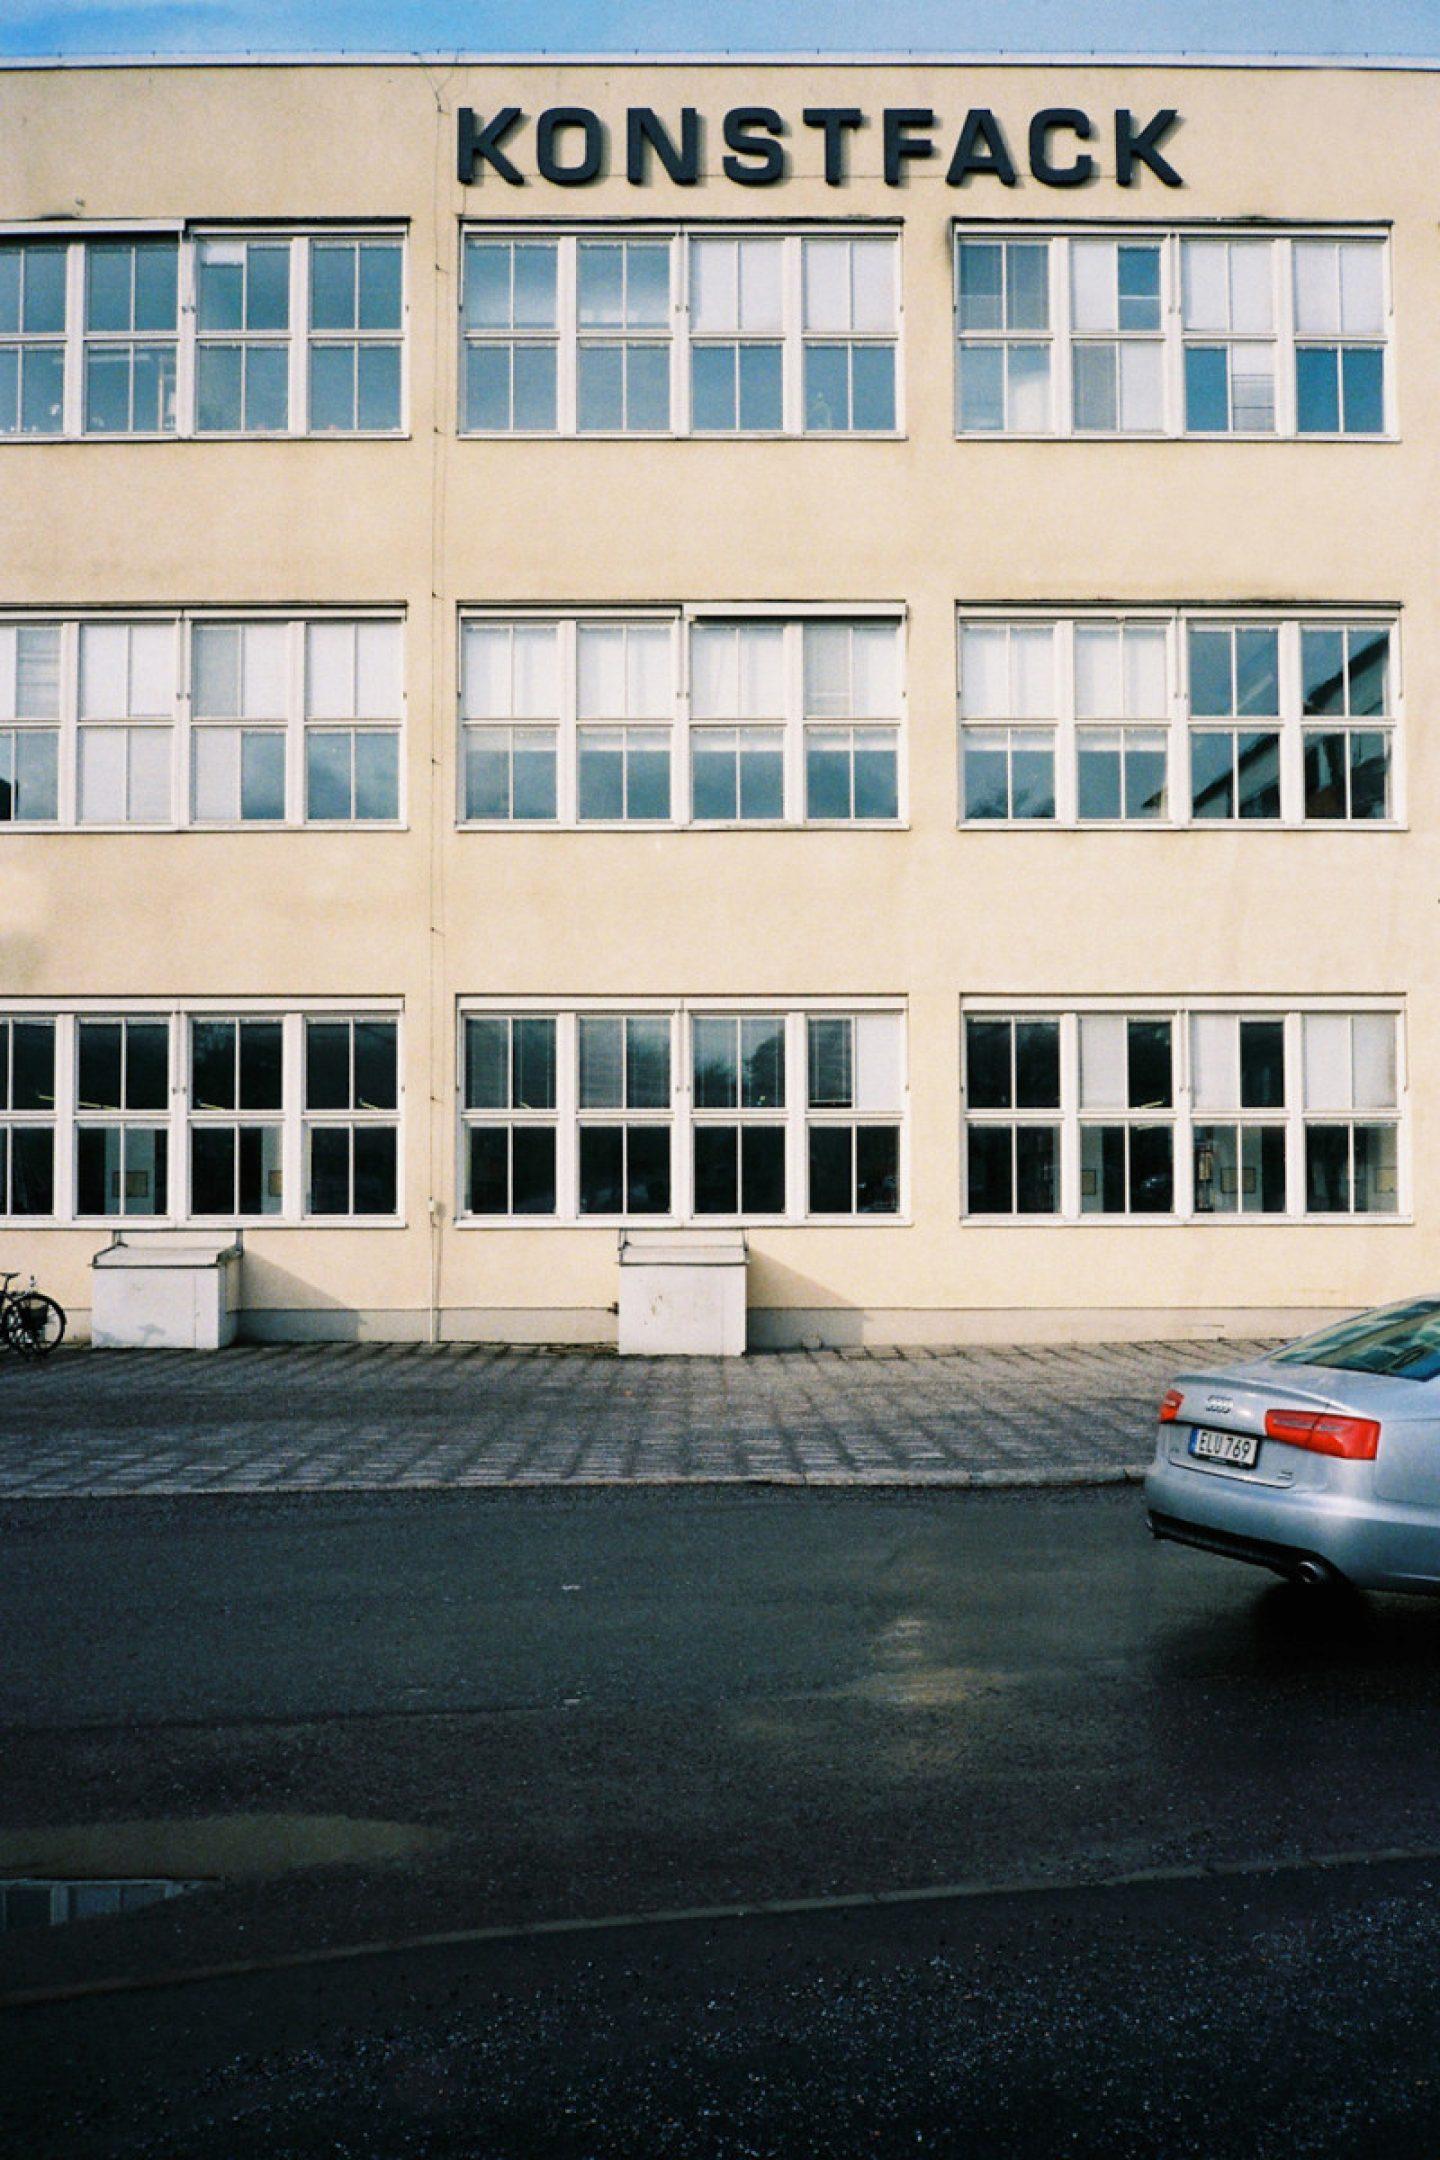 stockholm-diaries_ontheroad_004